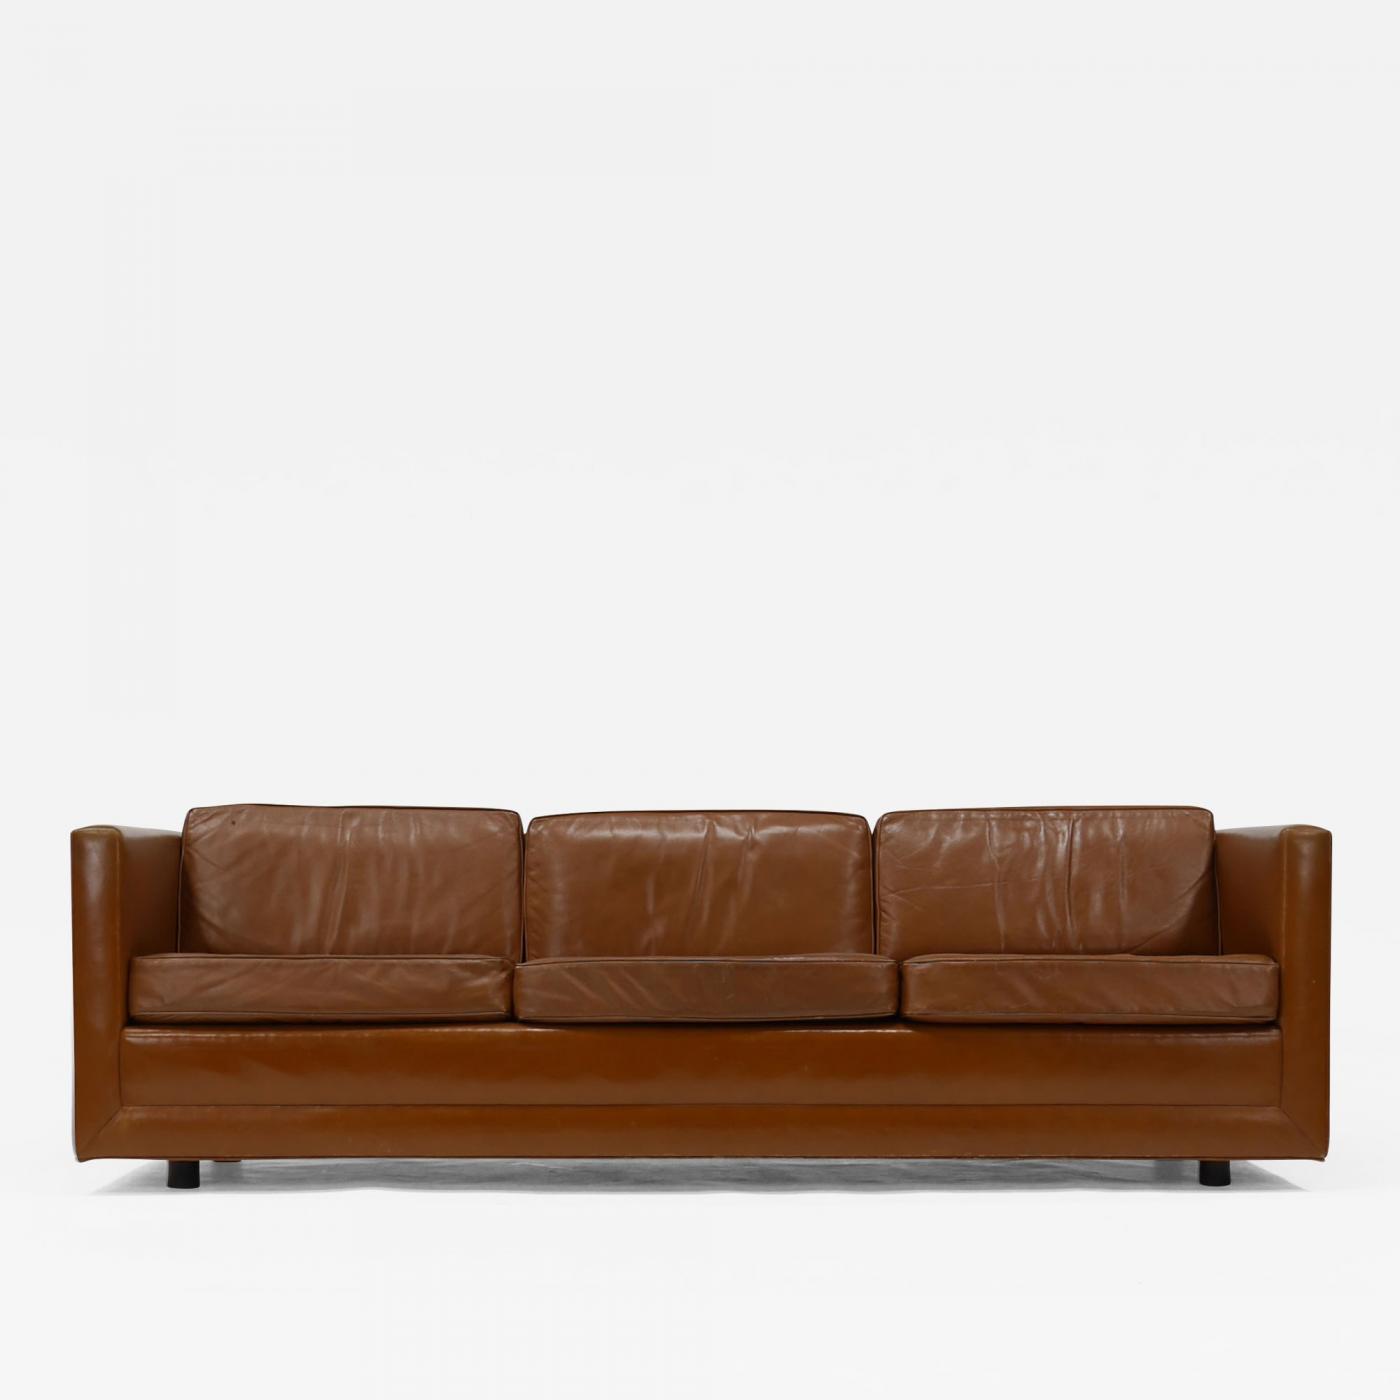 Harvey Probber Leather Tuxedo Sofa by Harvey Probber